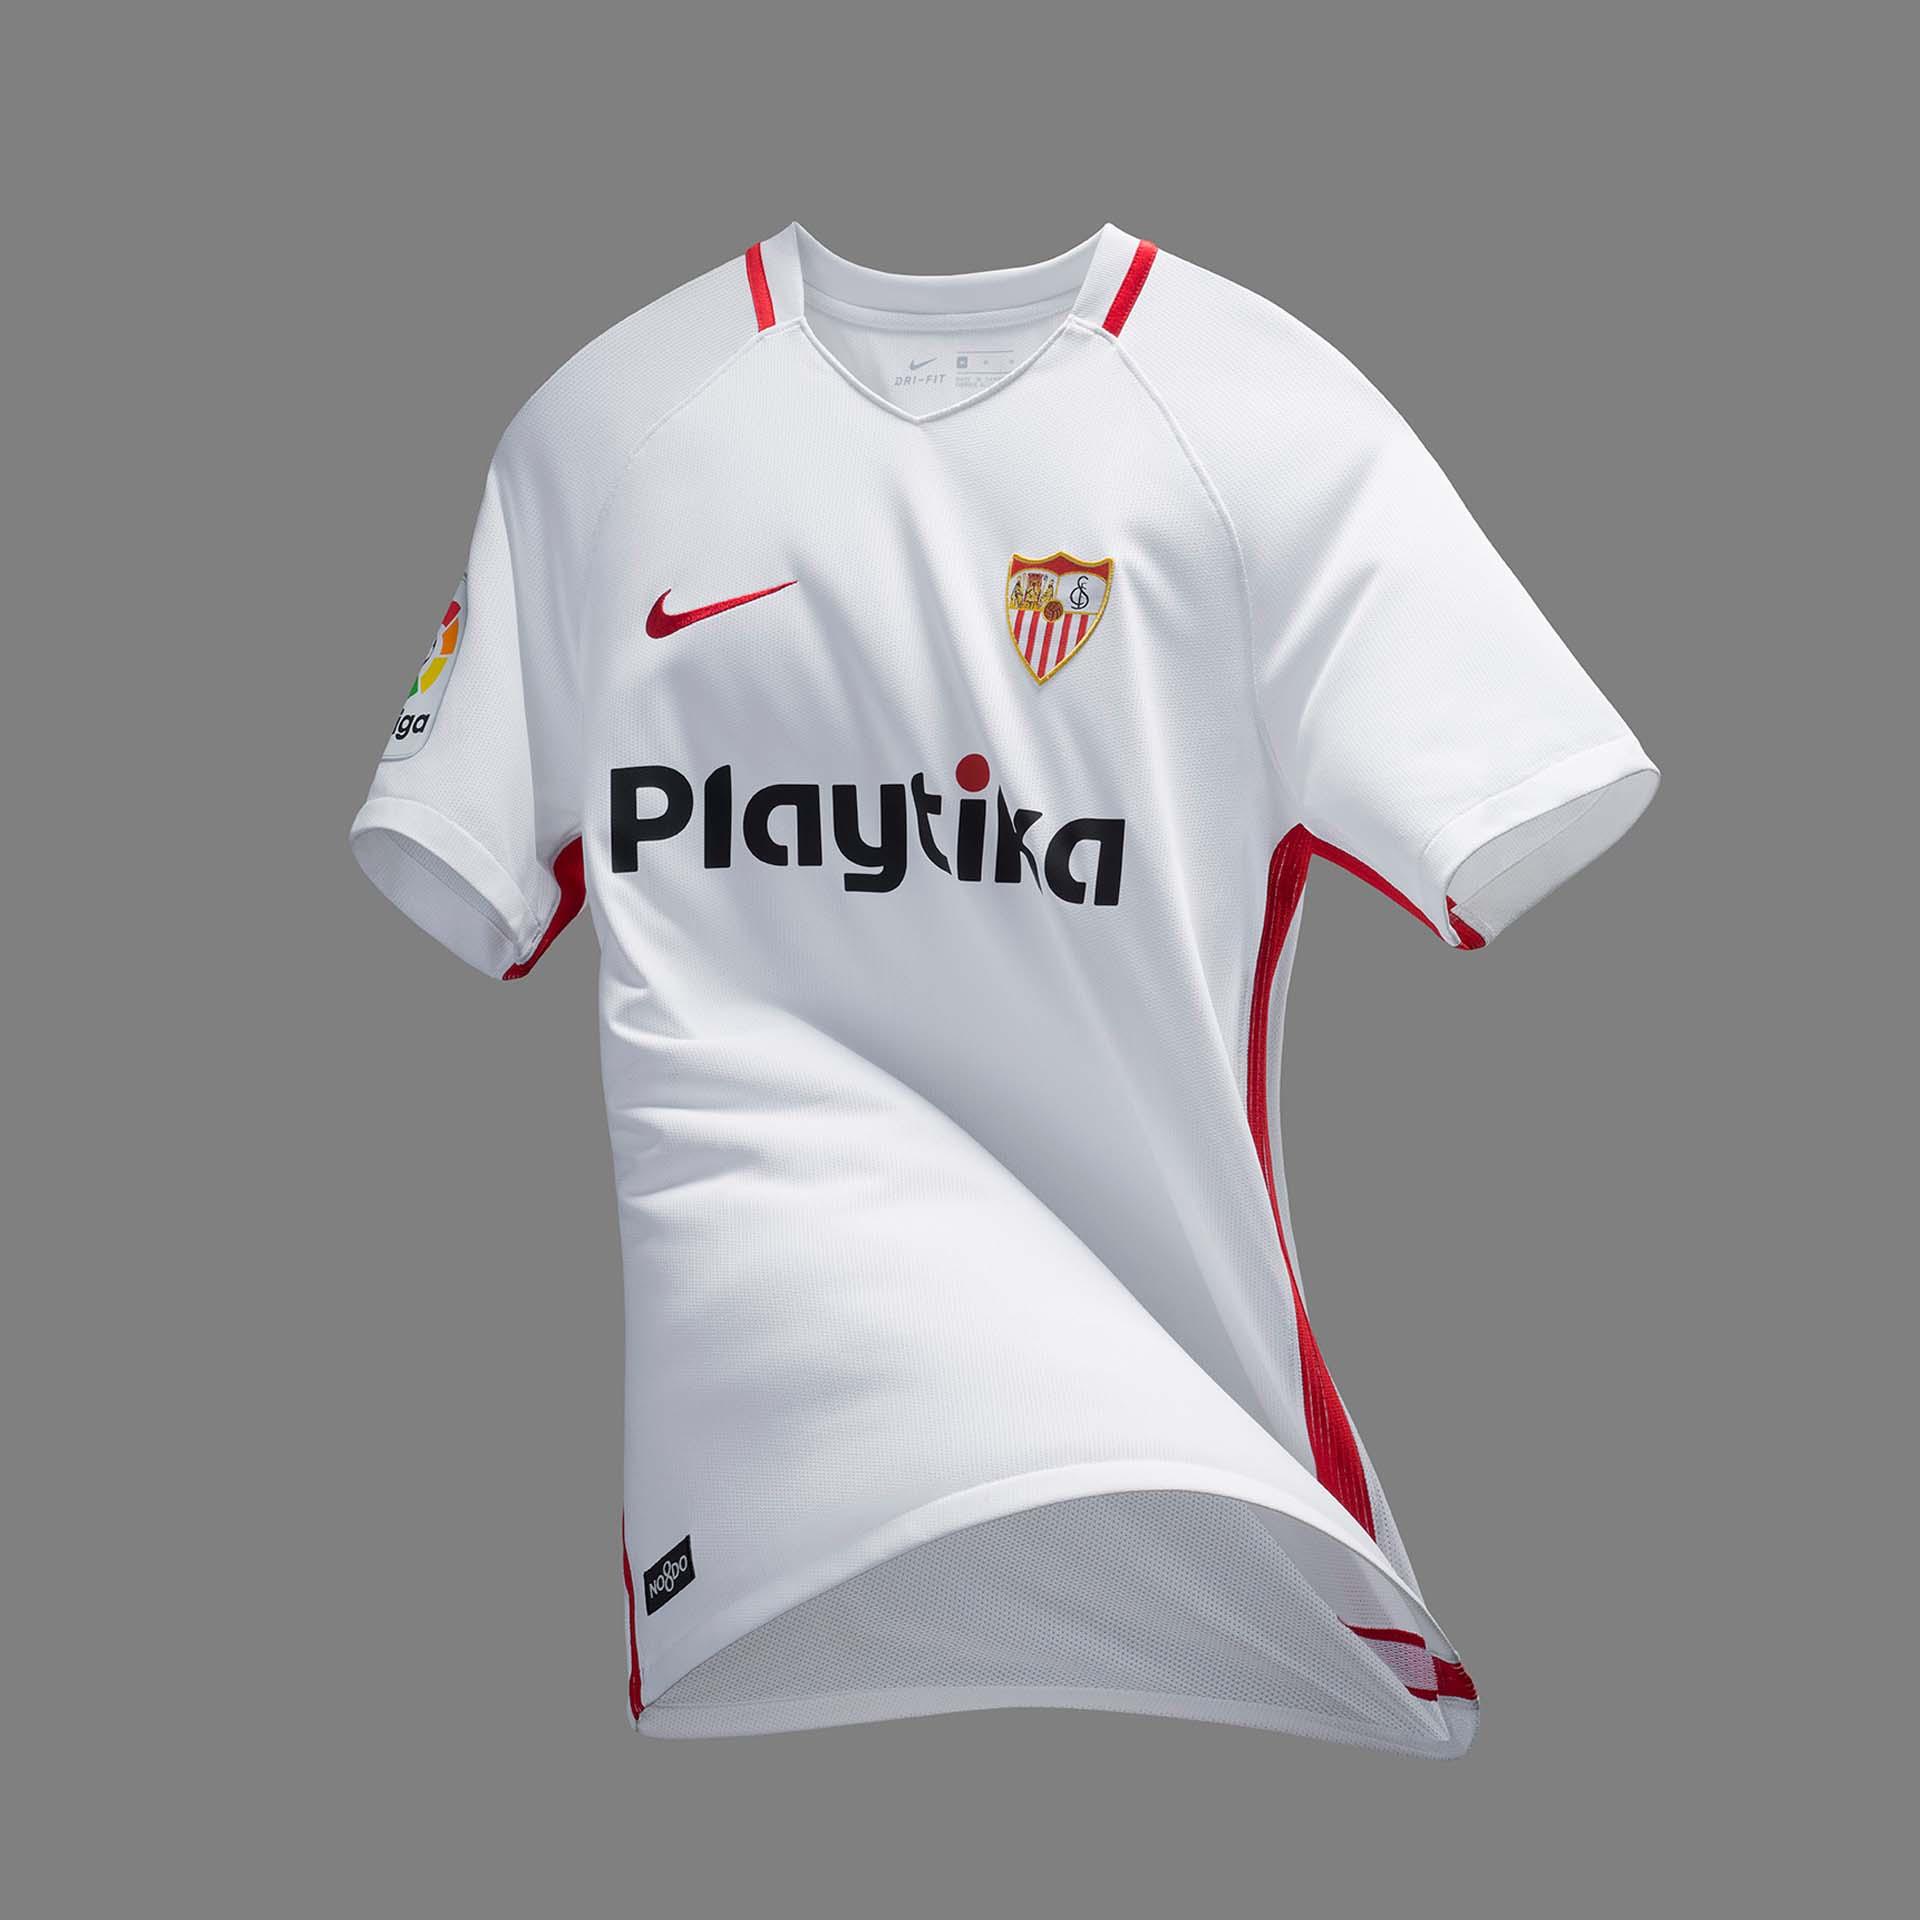 c6e26578a Nike Launch Sevilla 18/19 Home, Away & Third Shirts - SoccerBible